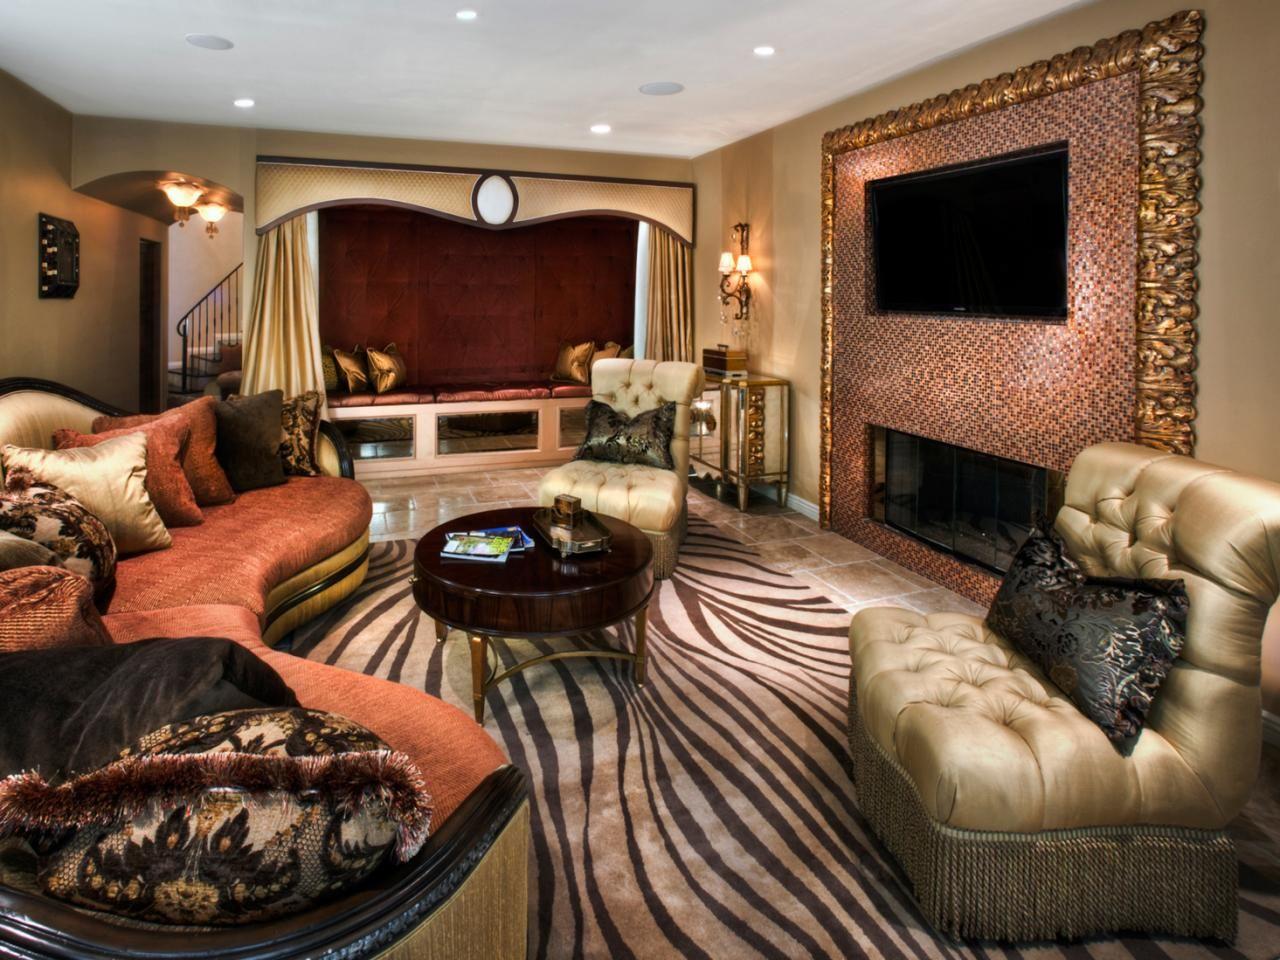 Enchanting Zebra Print Living Room Set on House Decor ...